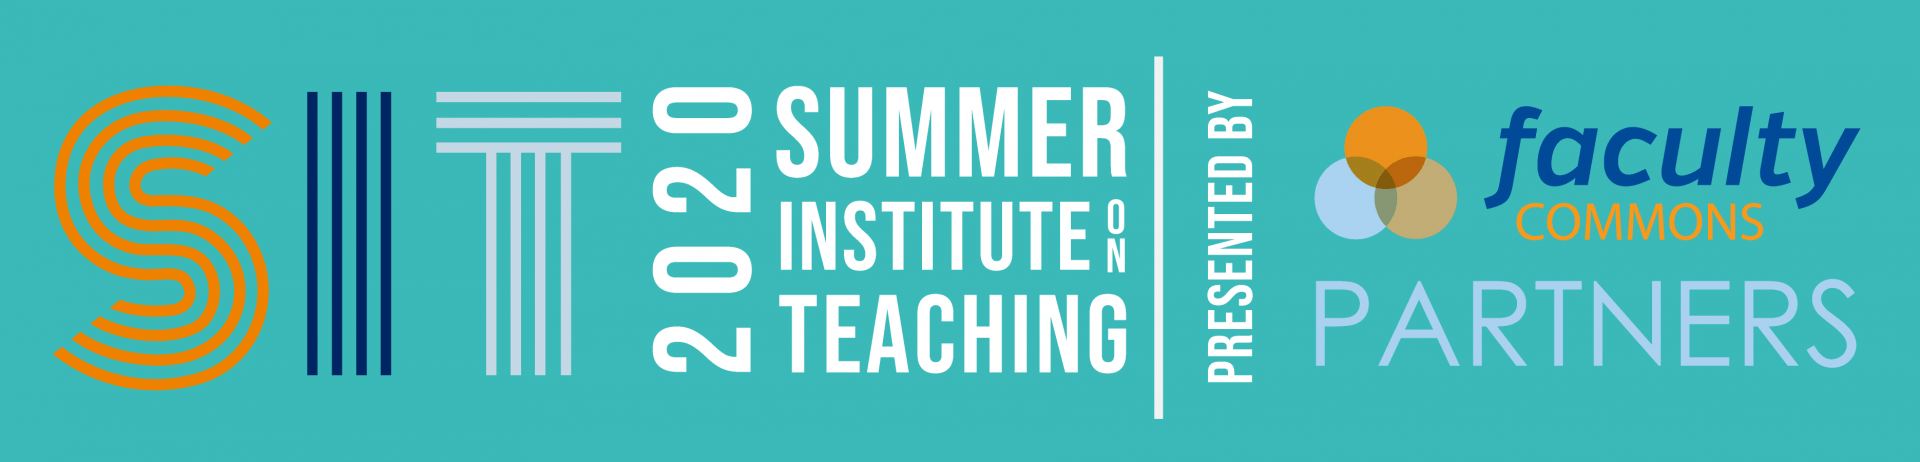 Summer Institute on Teaching